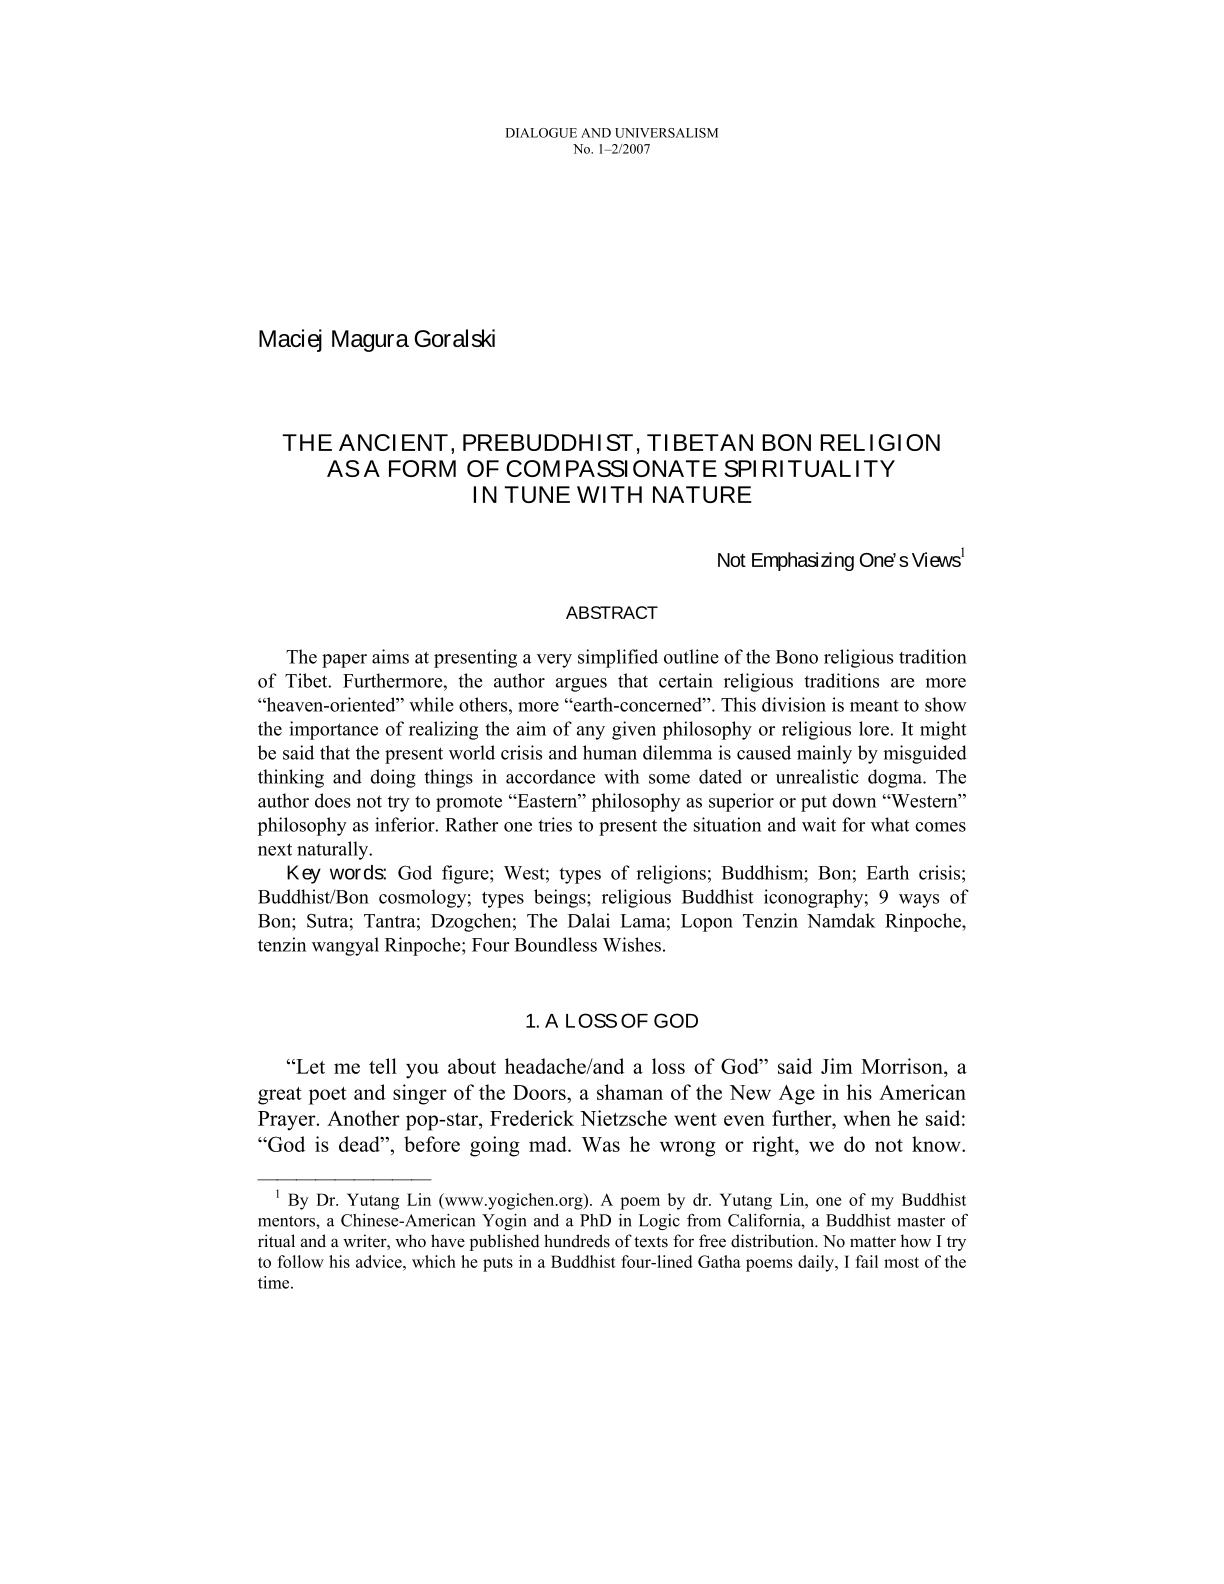 The Ancient, Prebuddhist, Tibetan Bon Religion as a Form of